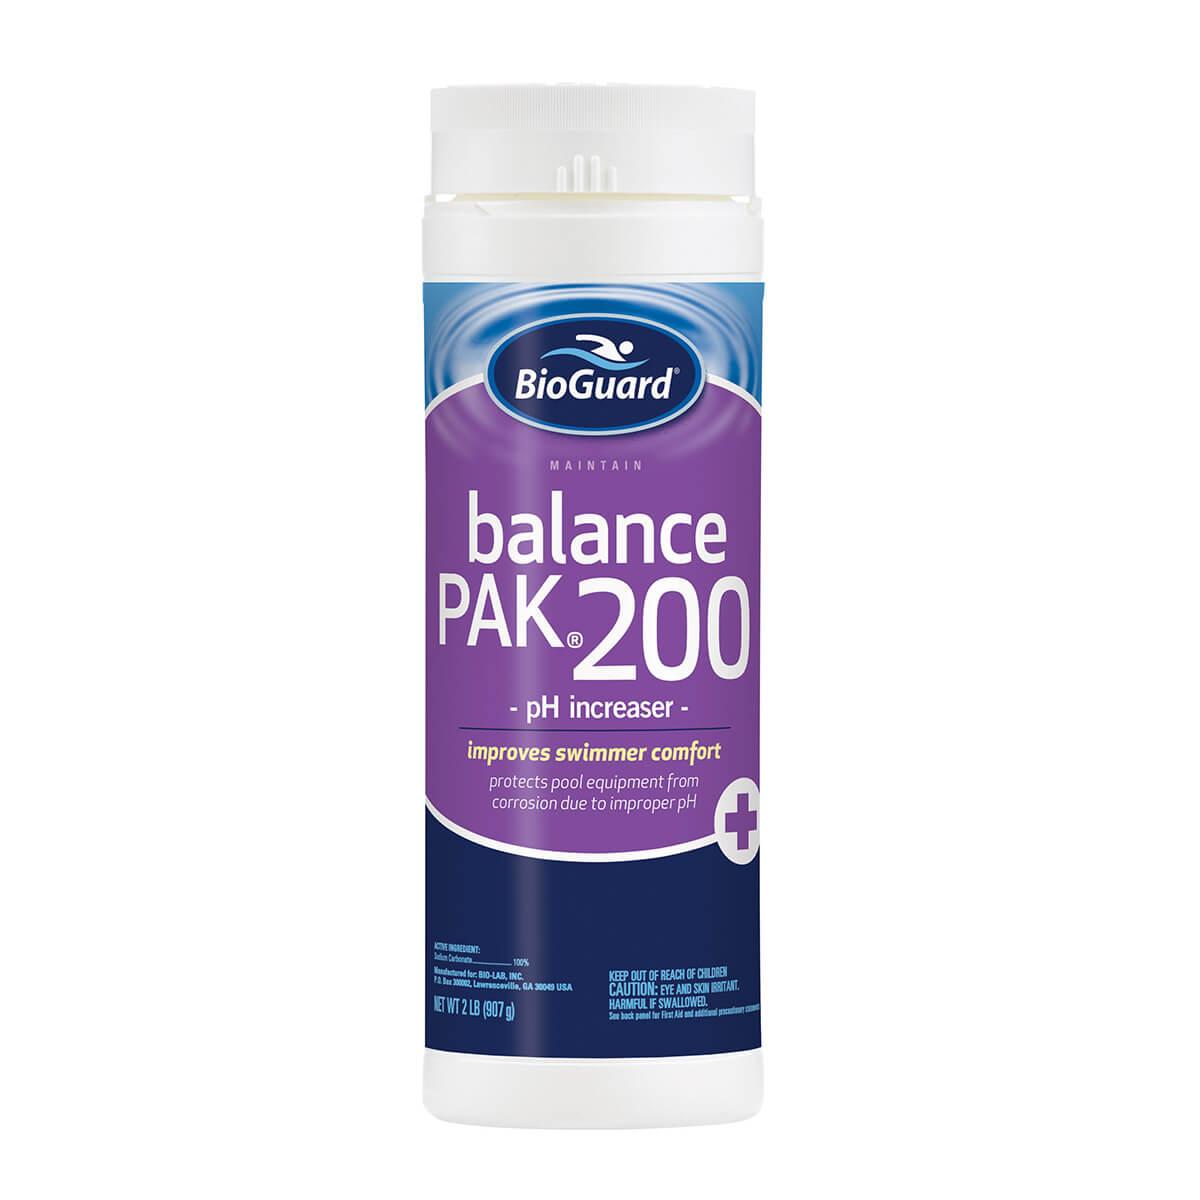 BioGuard Balance Pak 200